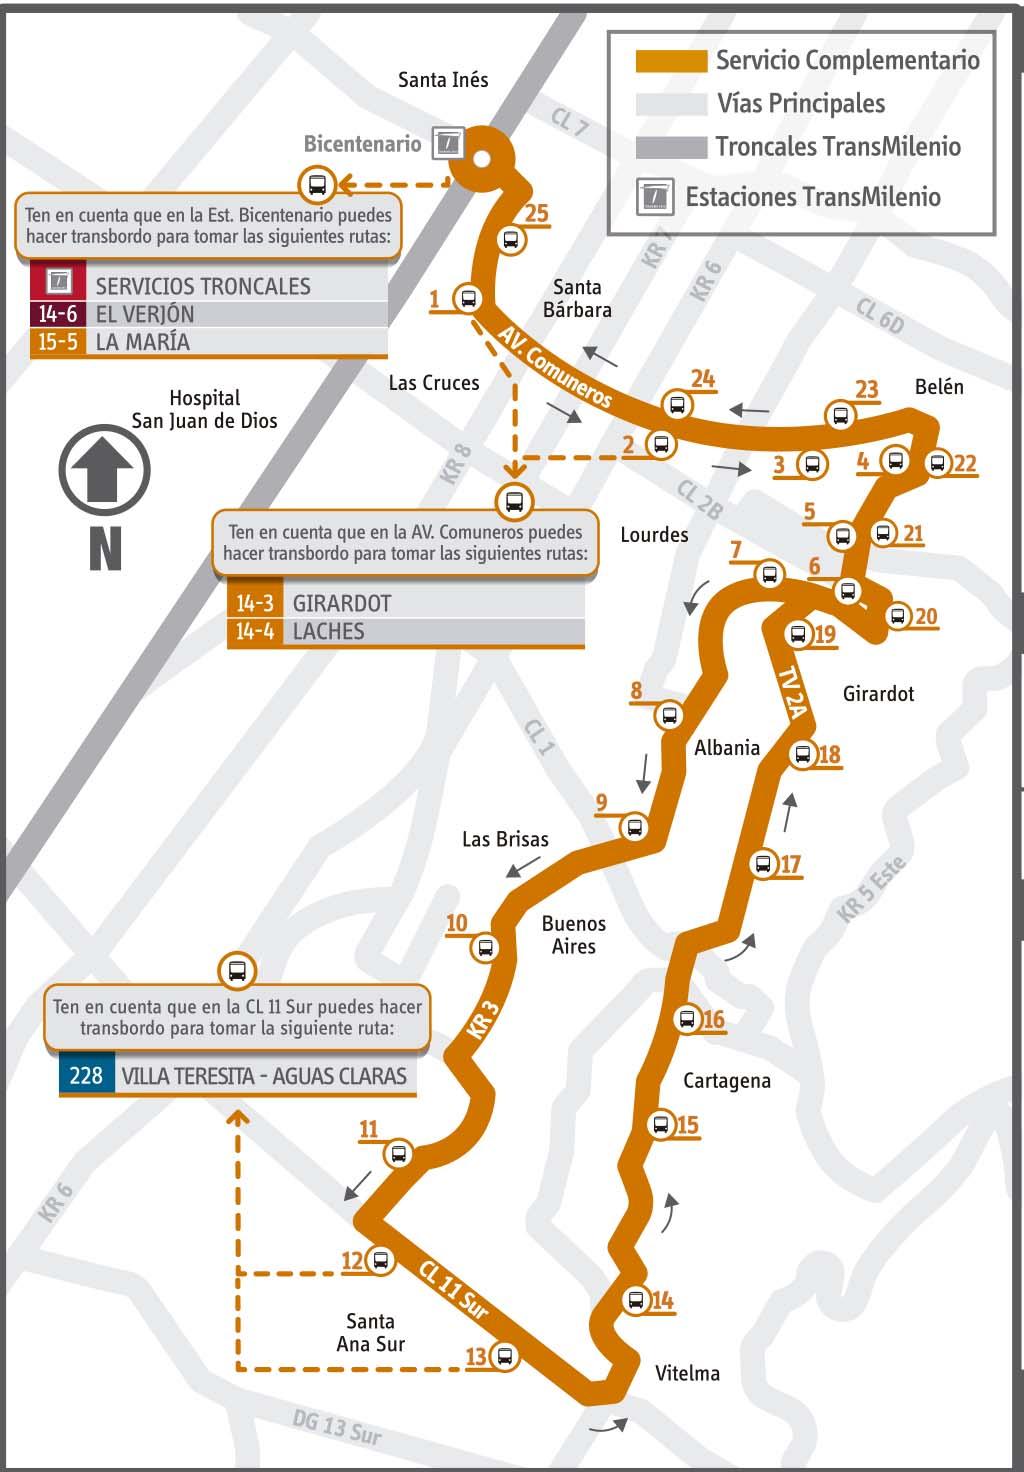 Ruta SITP: 14-7 Ramírez [Complementaria ] 2